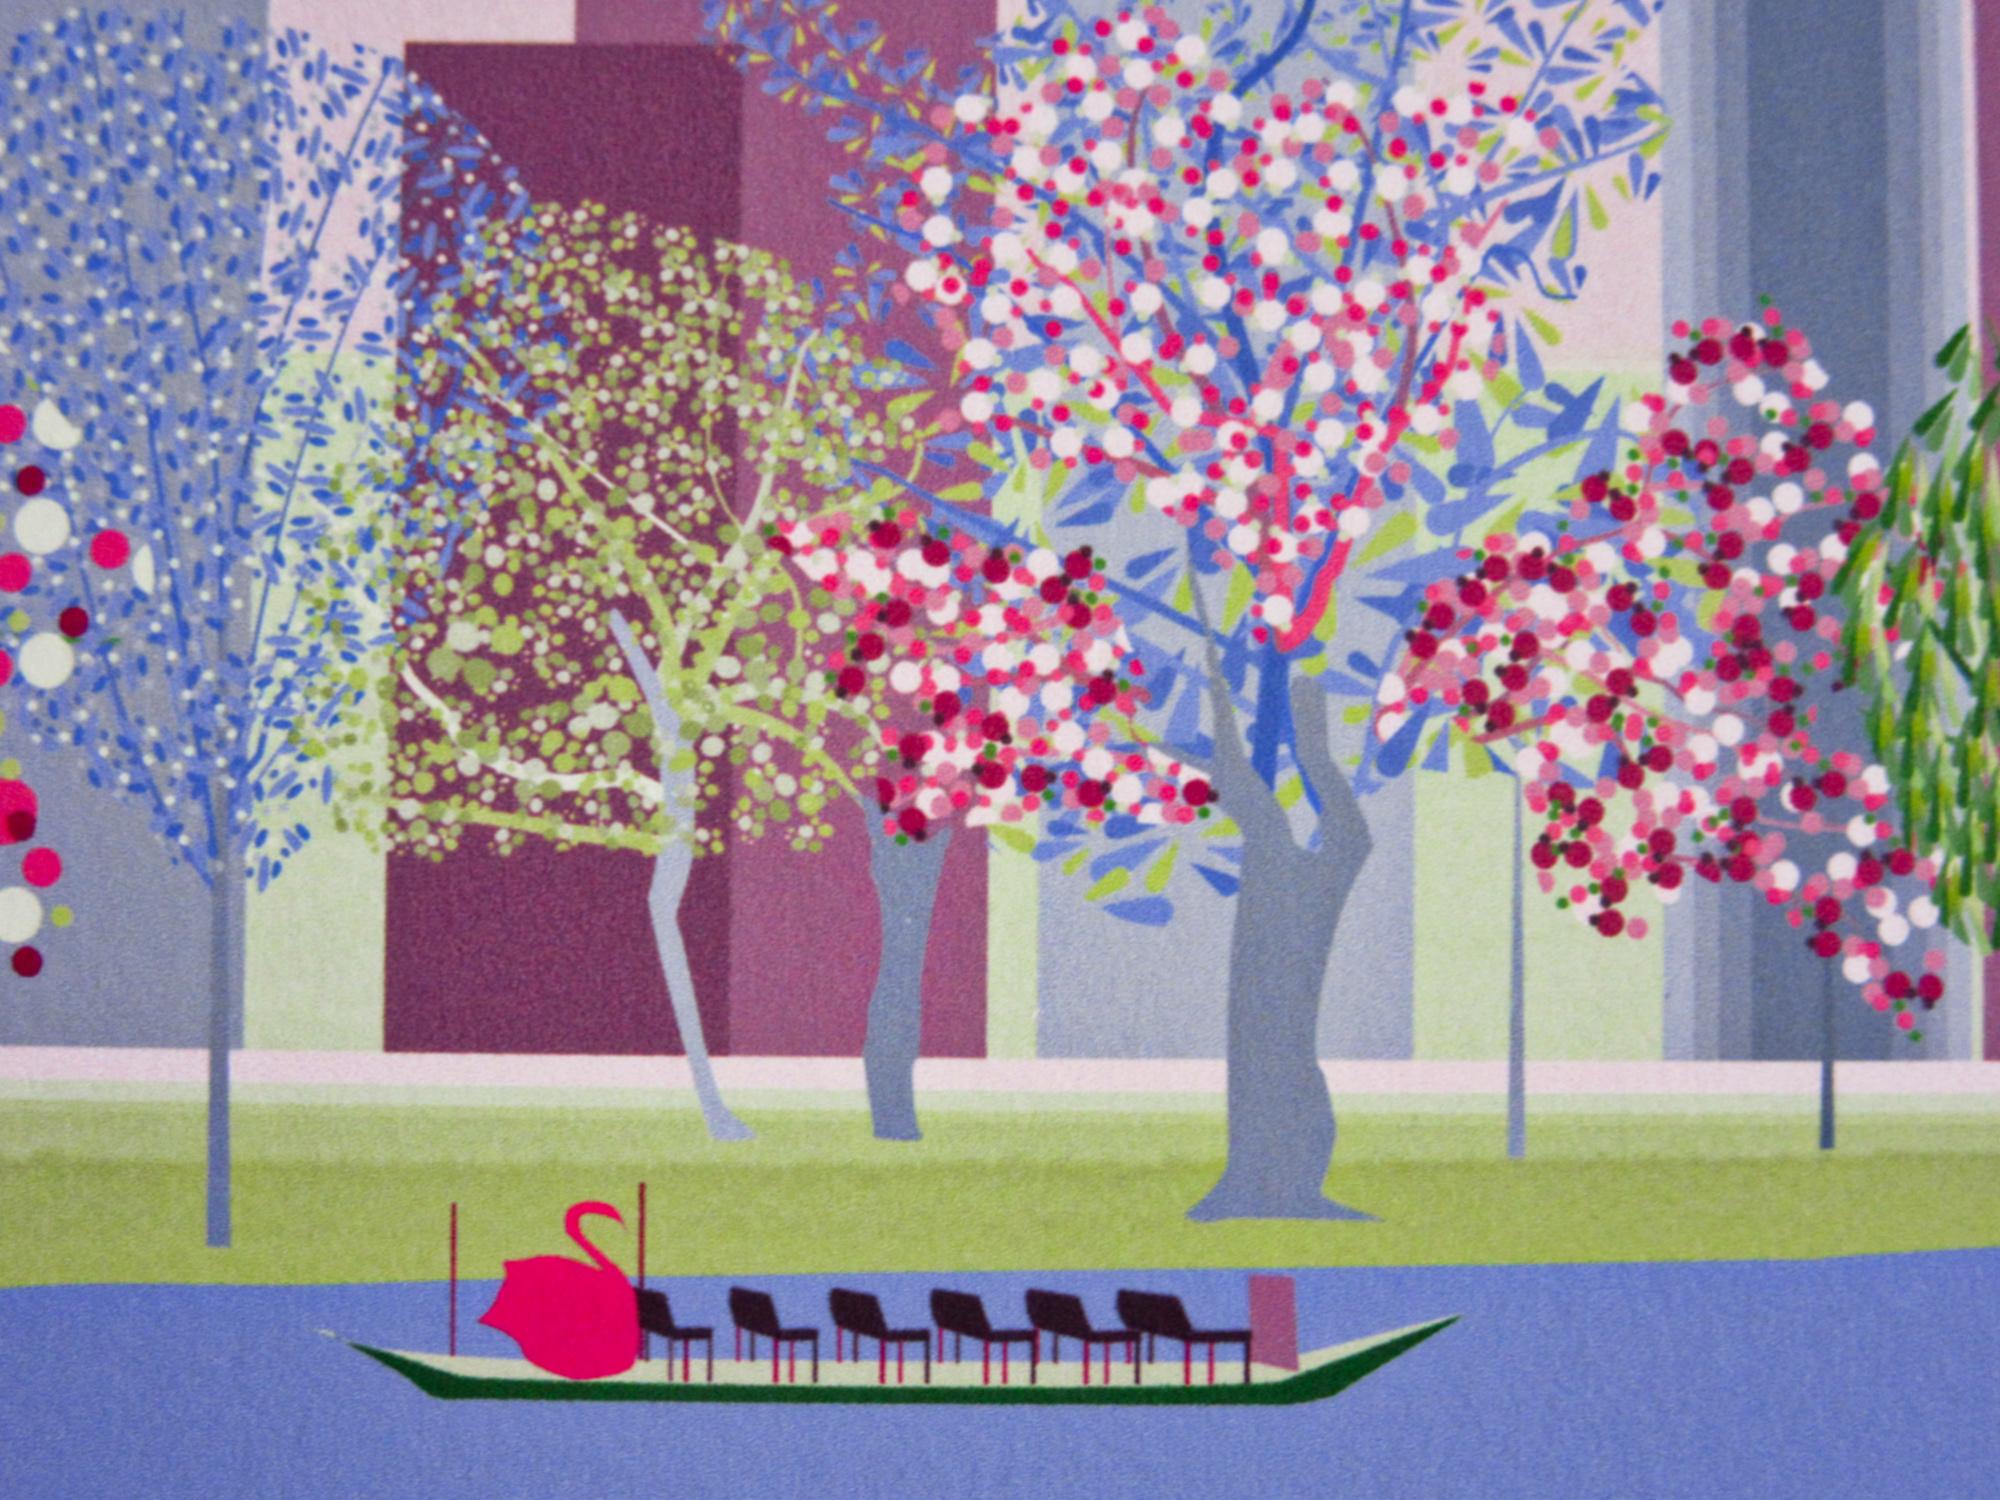 Boston-USA-Public-Garden-Art-Print_Swan-Boat-Detail_S.jpg